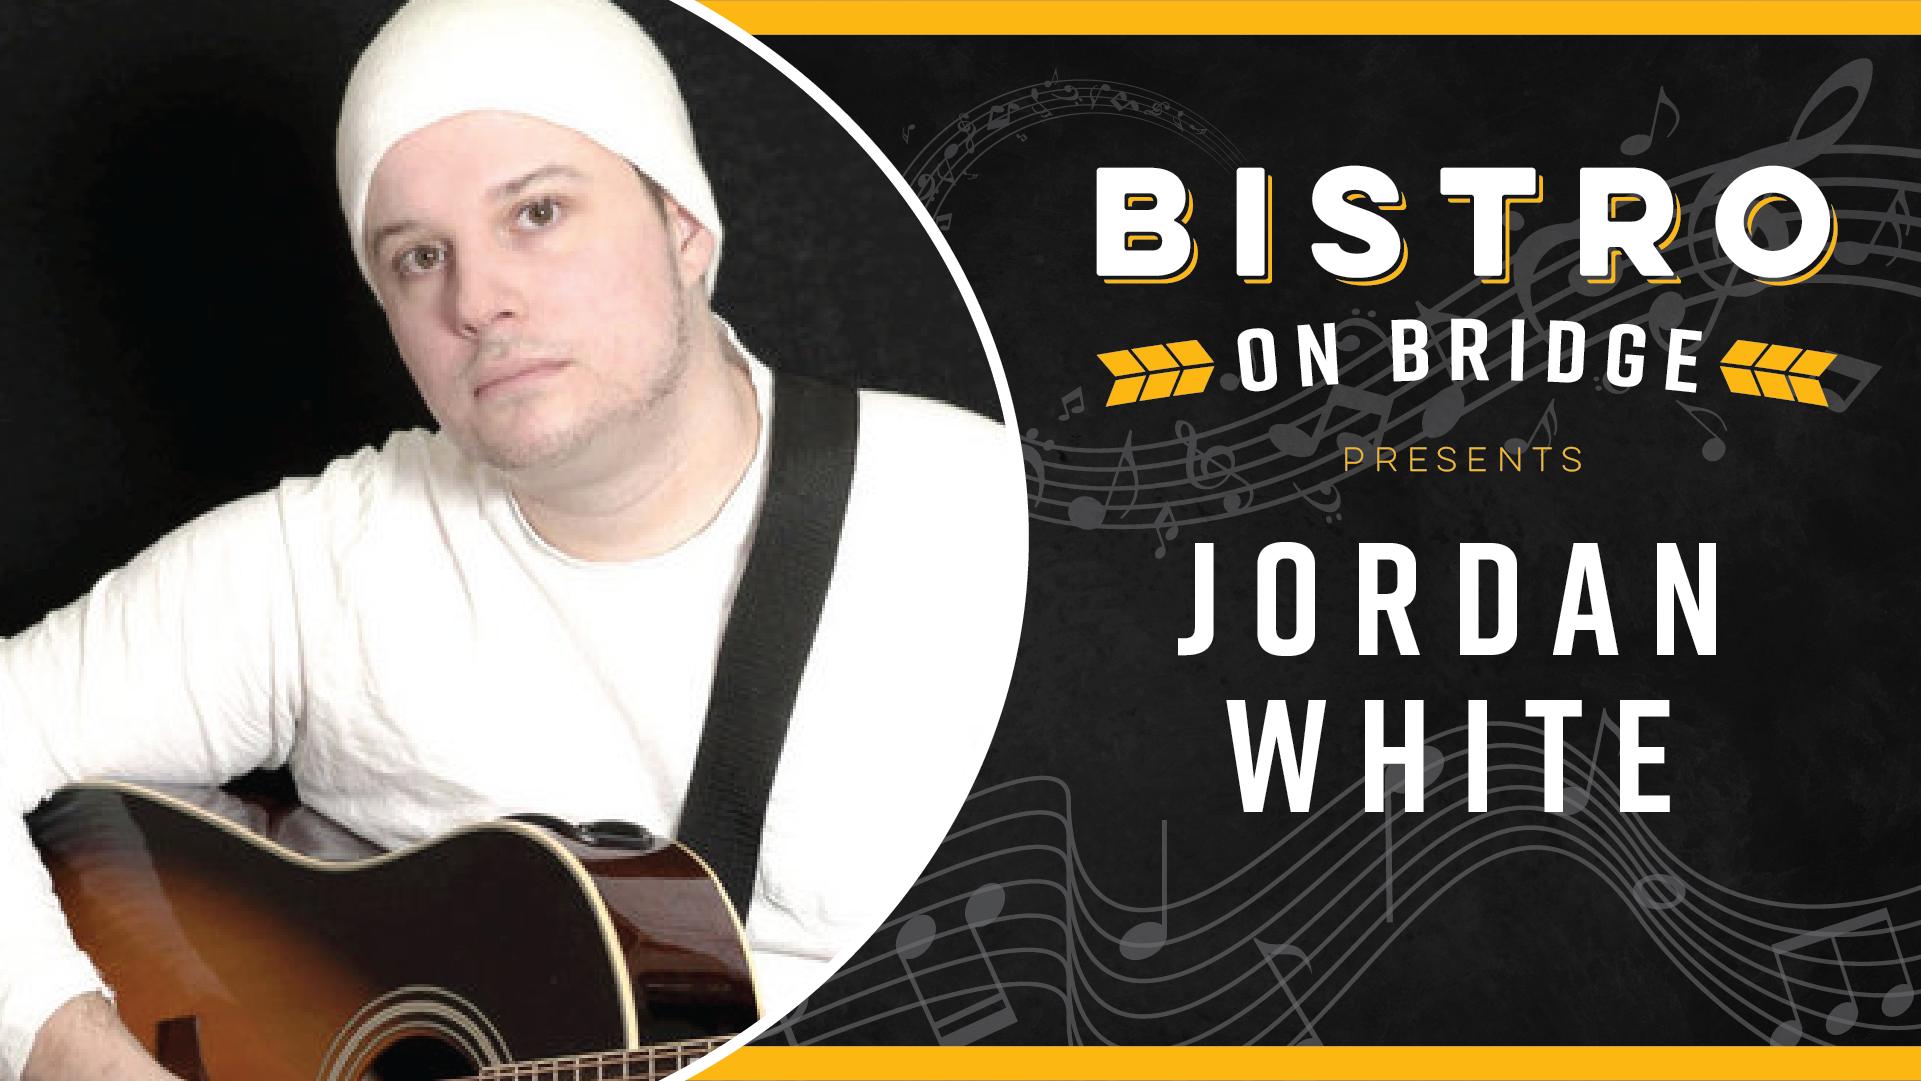 Jordan White